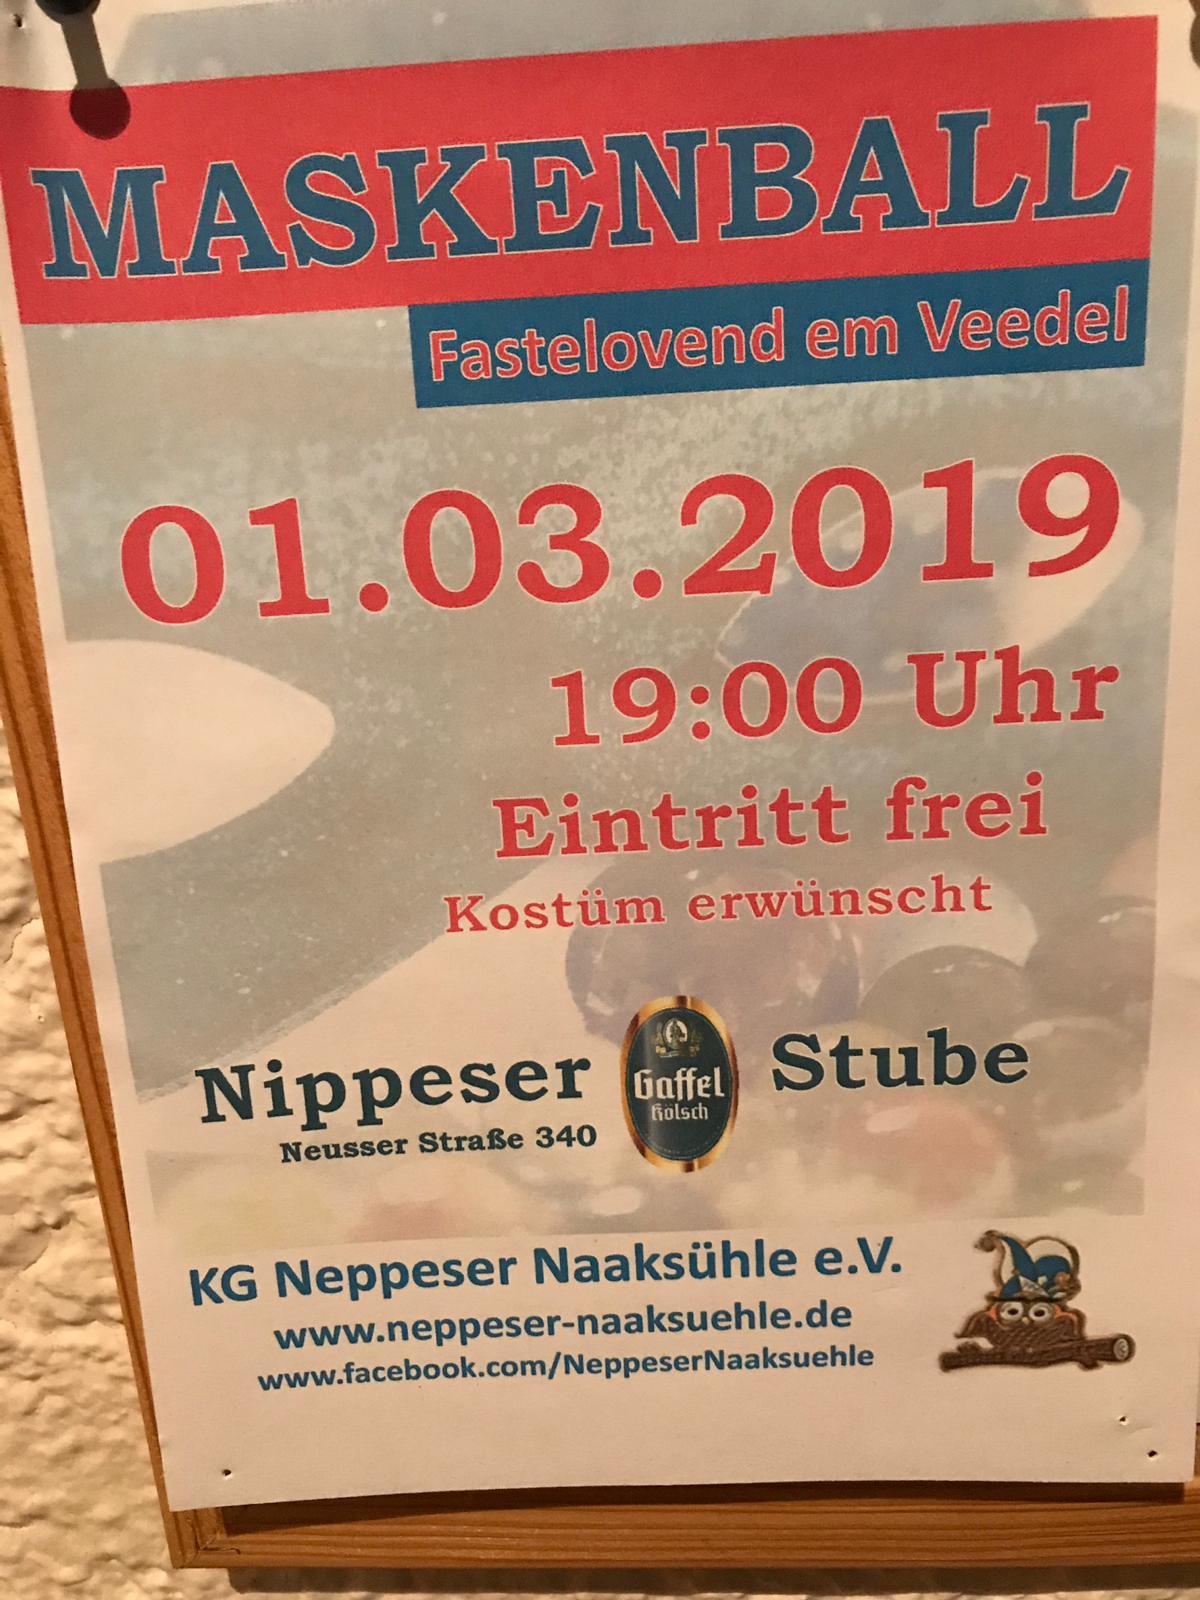 01.03.19 Maskenball – Fasteloven em Veedel